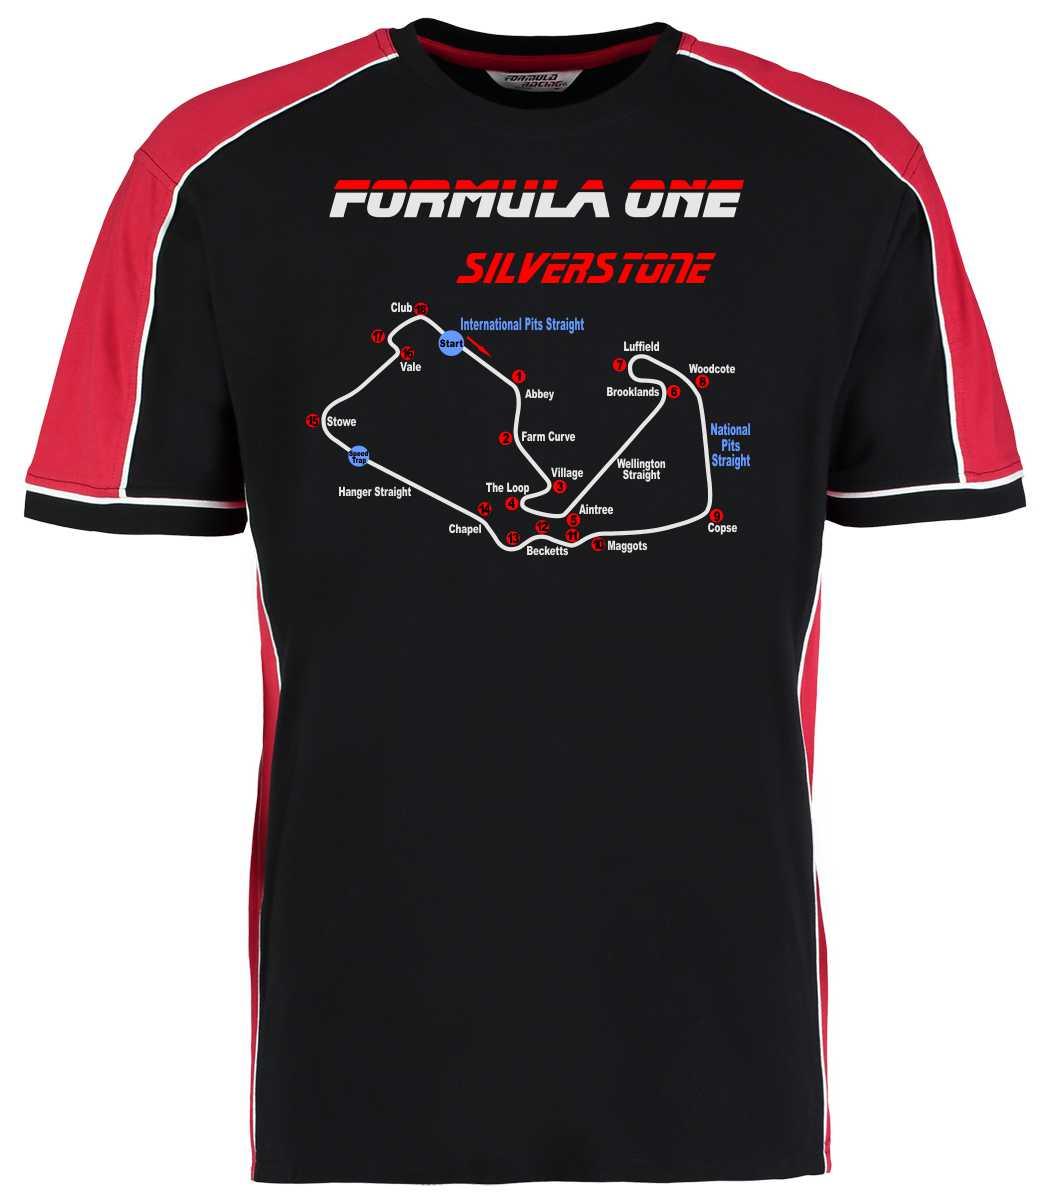 F1 British Silverstone T-Shirt